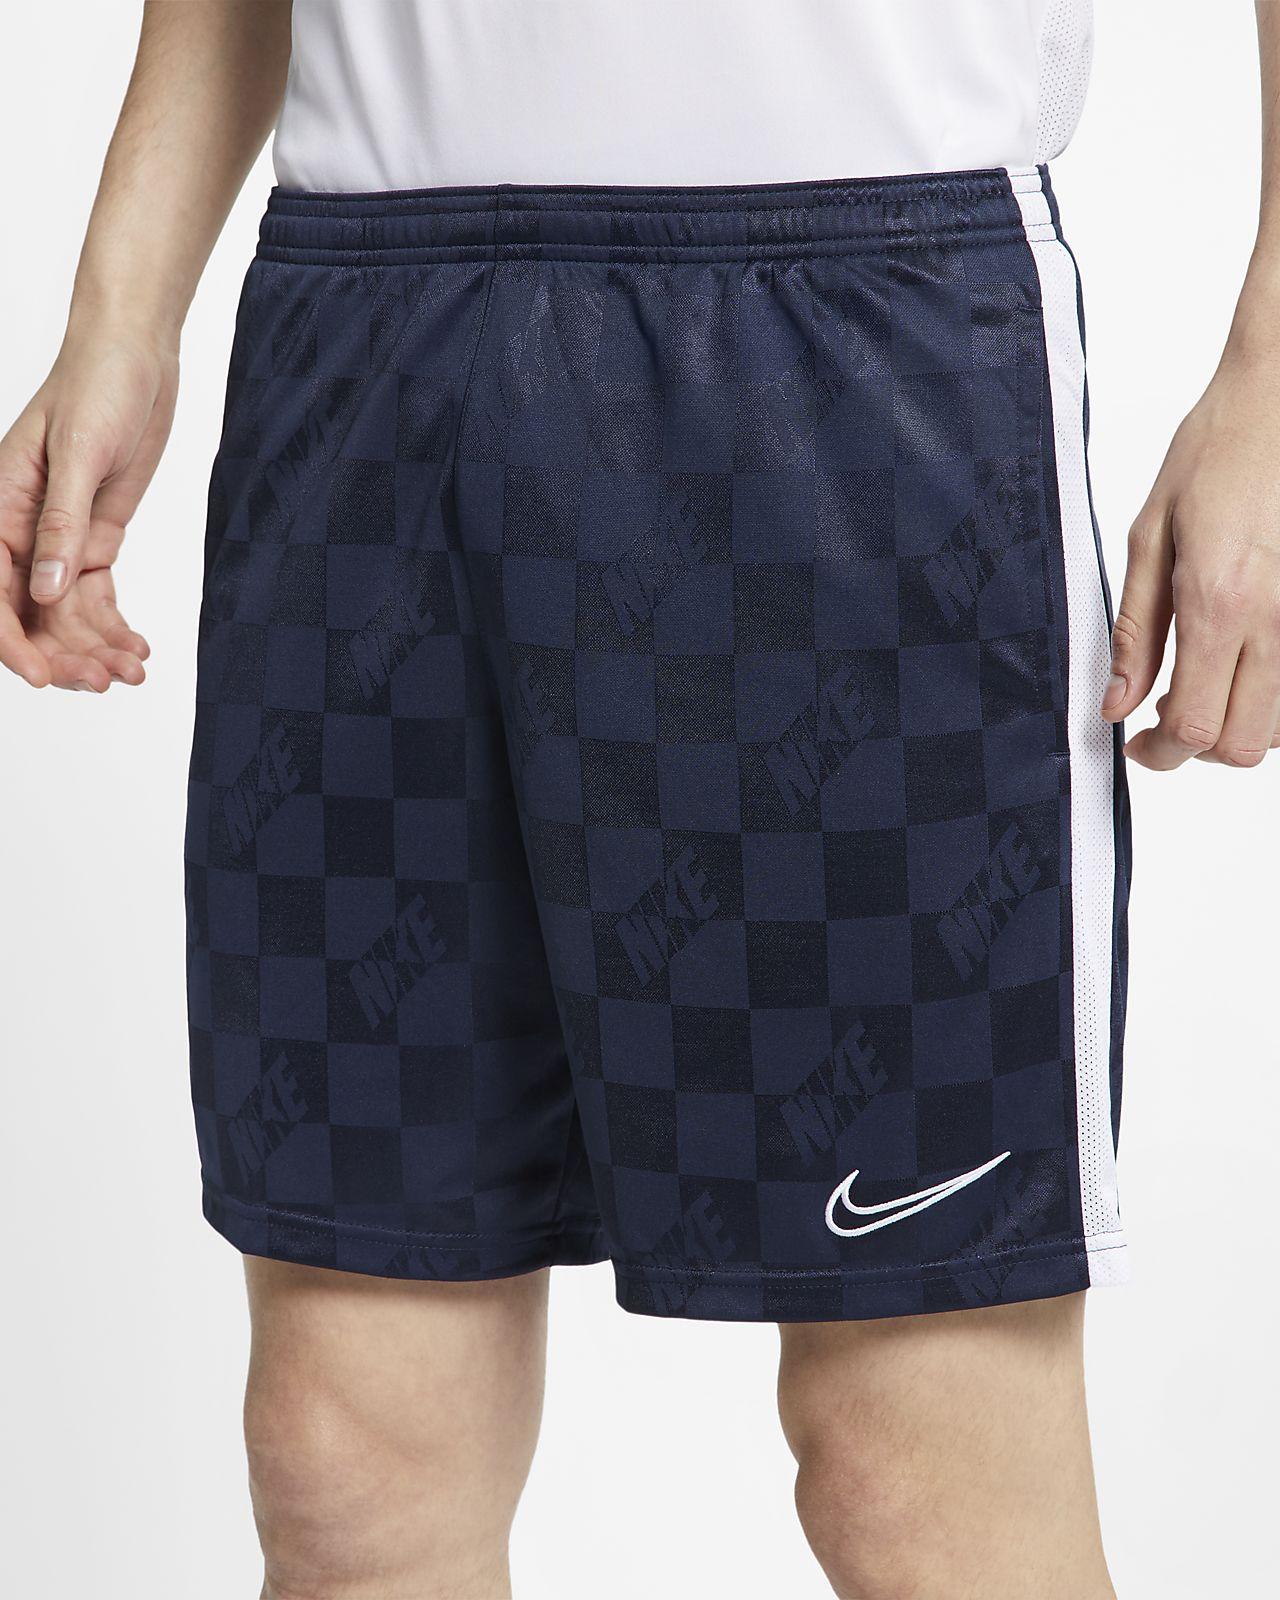 Nike Breathe Academy Herren-Fußballshorts